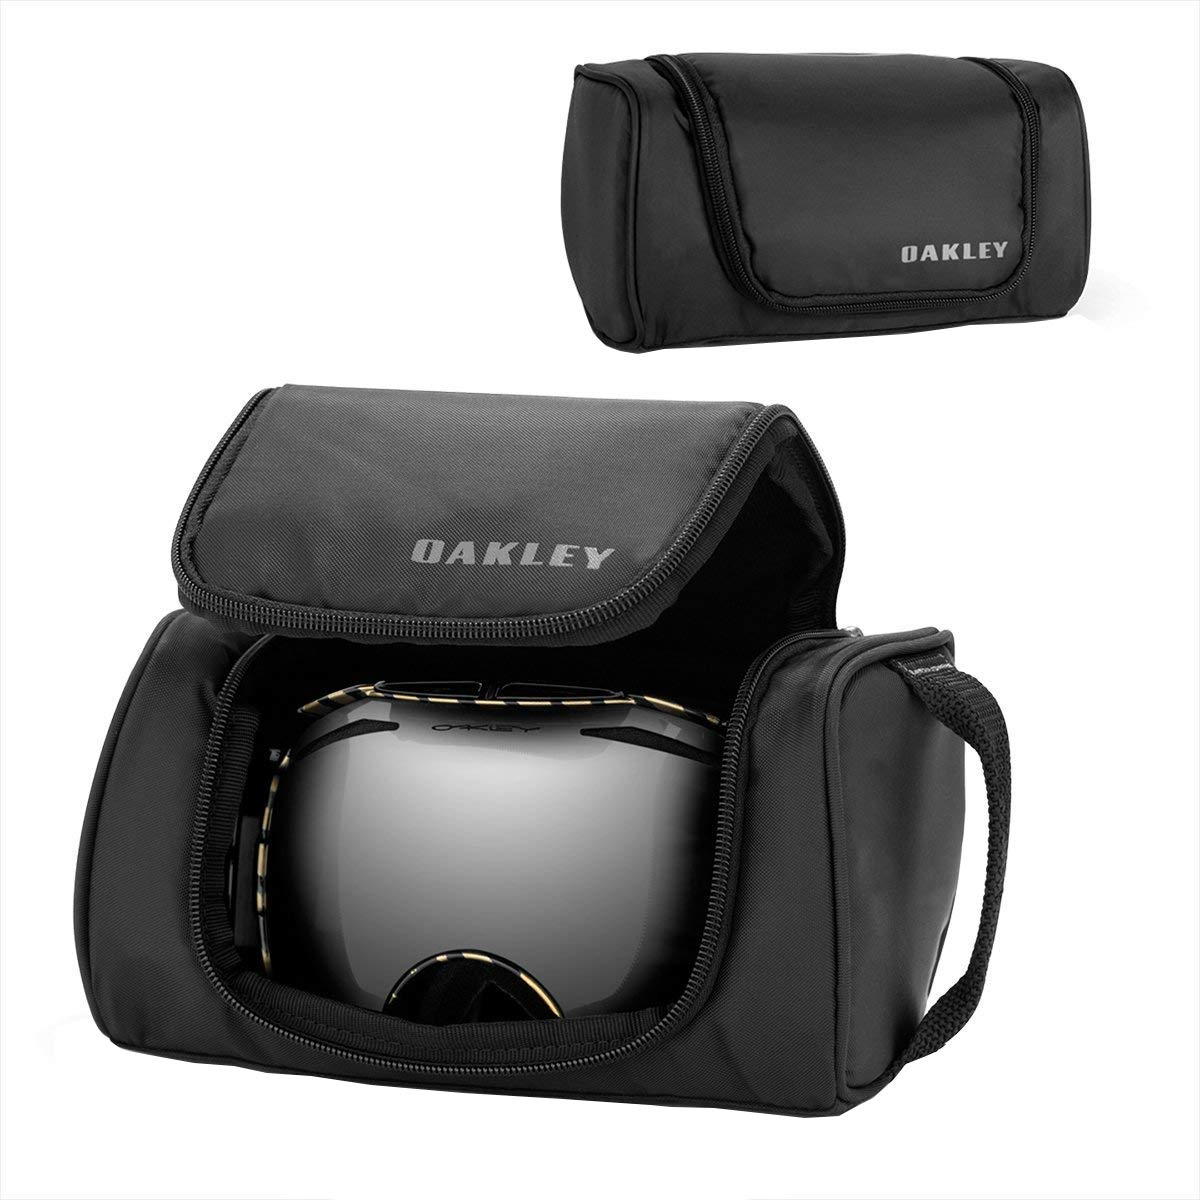 Oakley Oakley Universal Soft Goggles Case (Black)